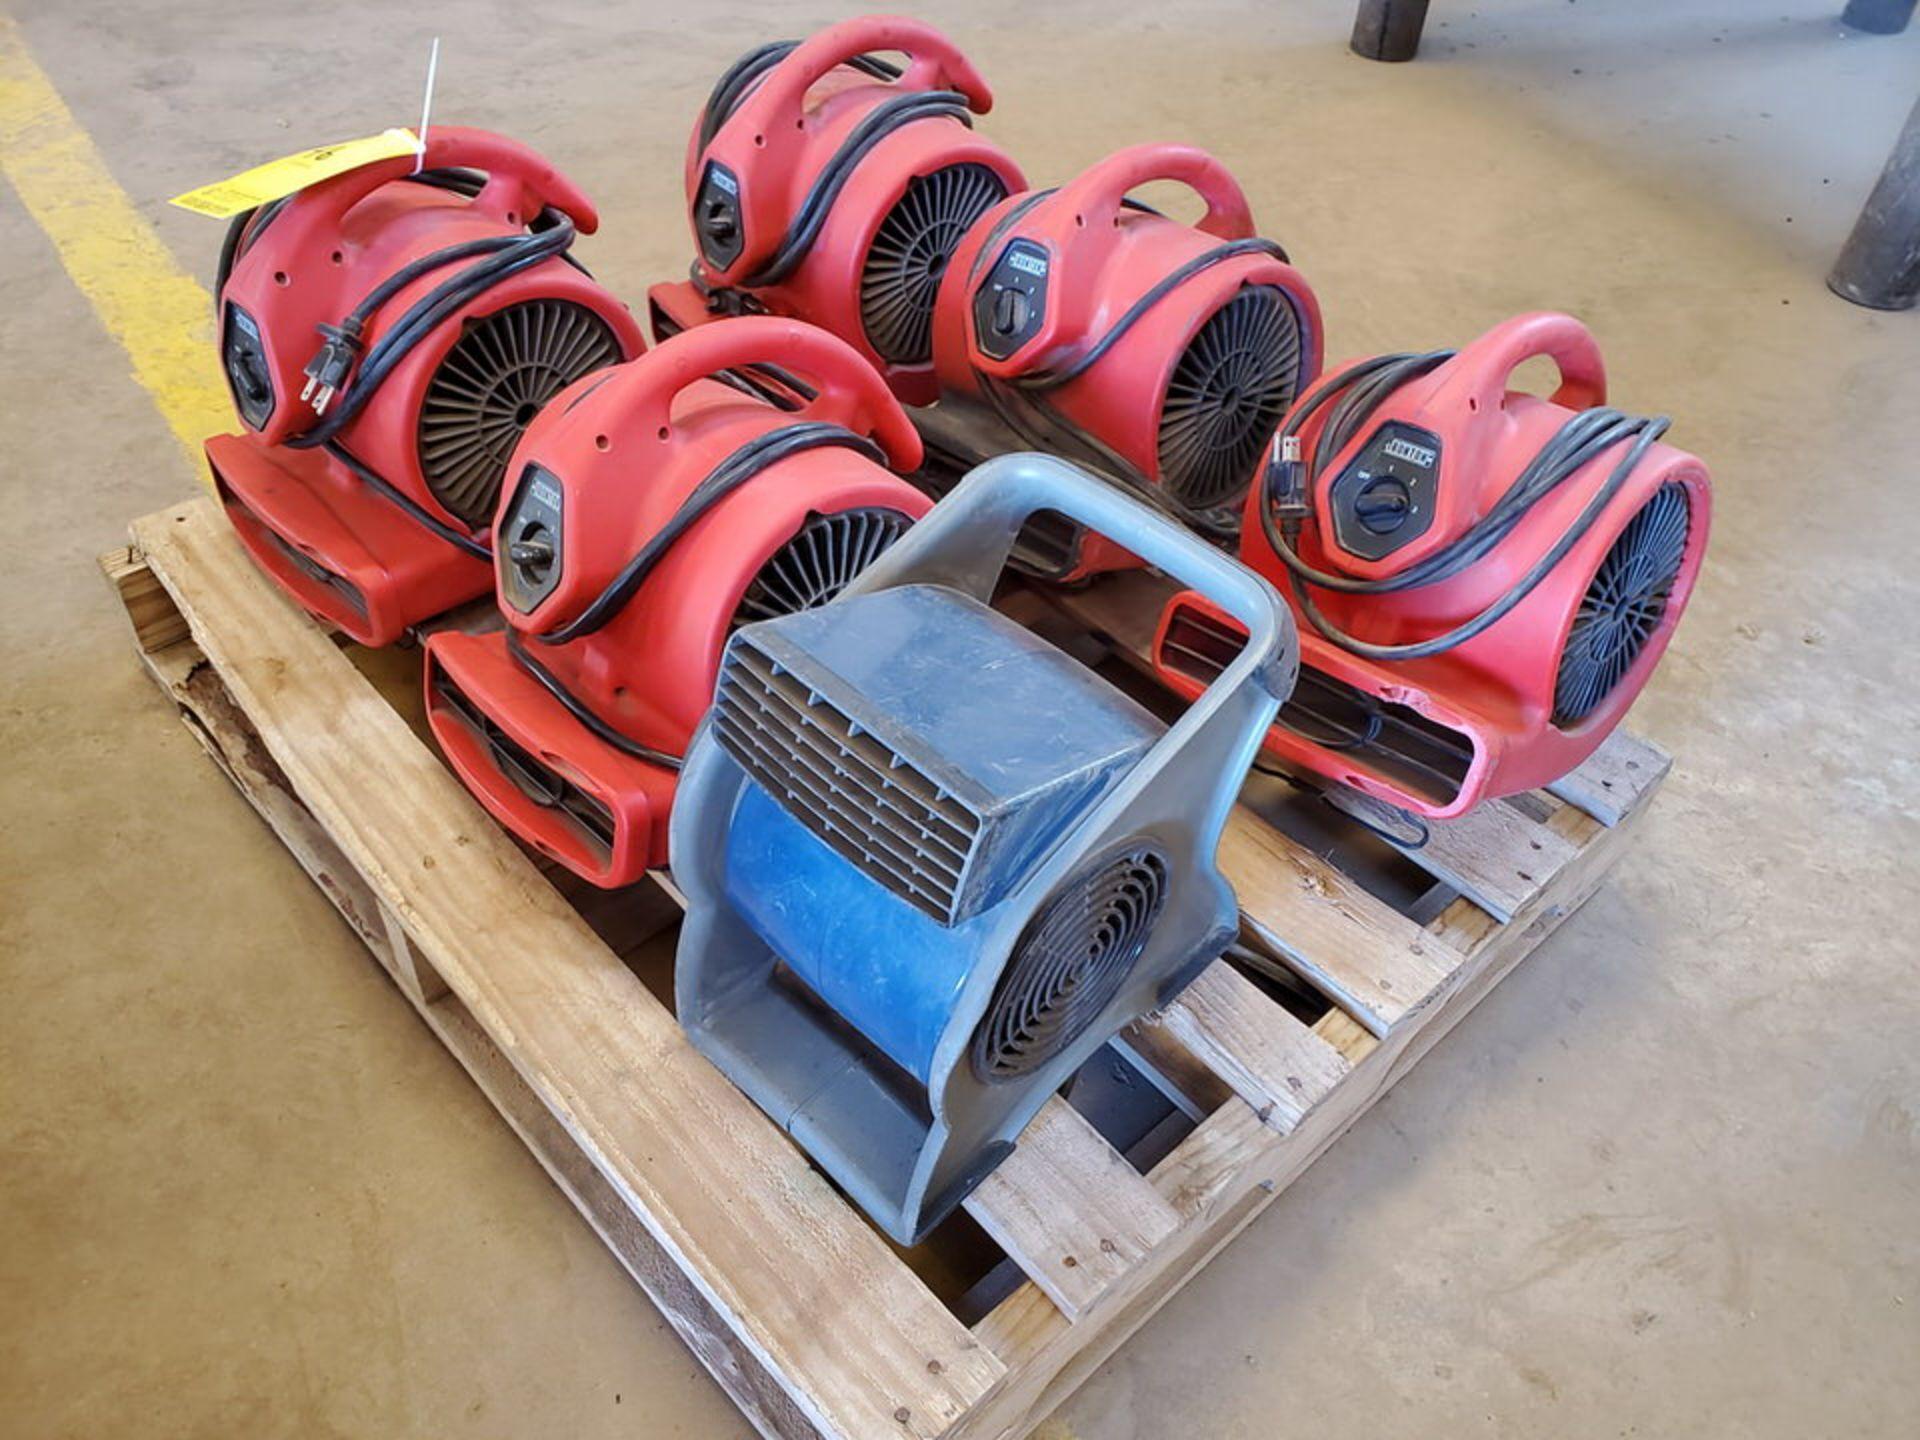 Ironton & Lasko (6) Air Blowers (5) 115V,1/8HP, 60HZ, 1.5A; (1) 120V, 60HZ - Image 3 of 4